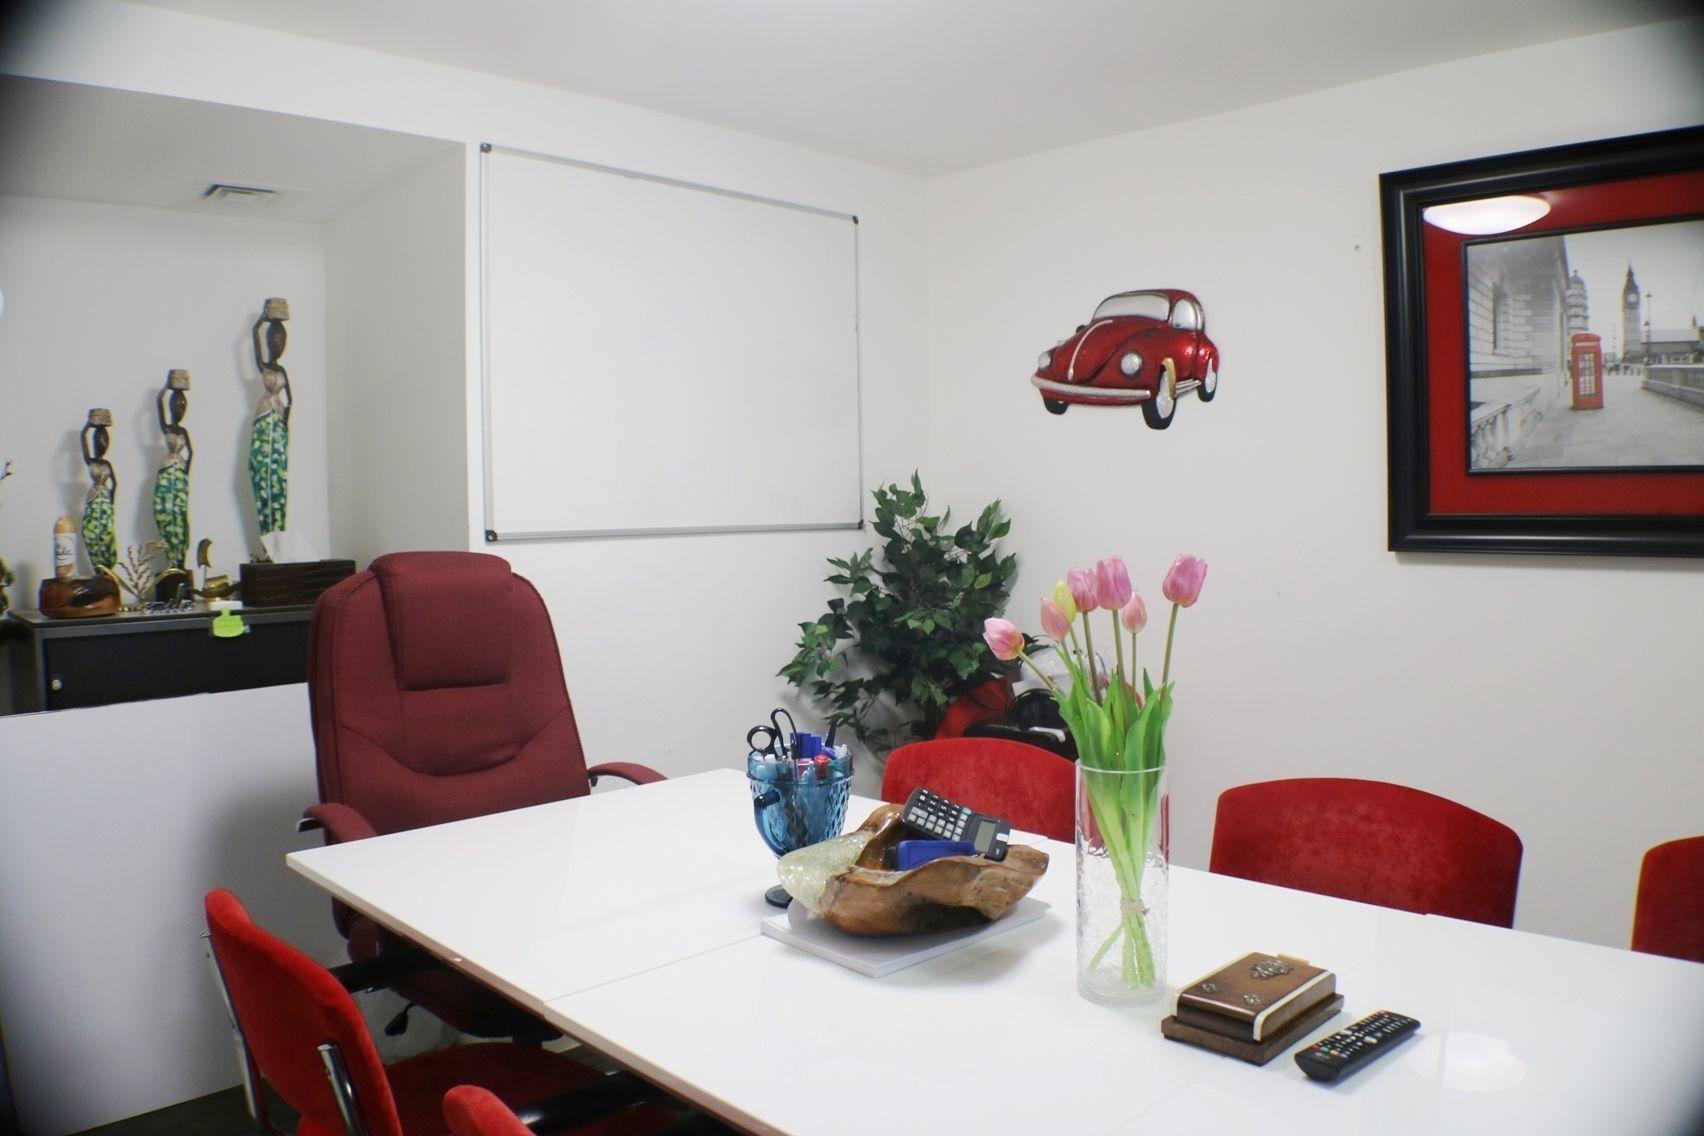 Conference/ Meeting room , Conference / Meeting Room near Liverpool St/Aldgate East/Shoreditch